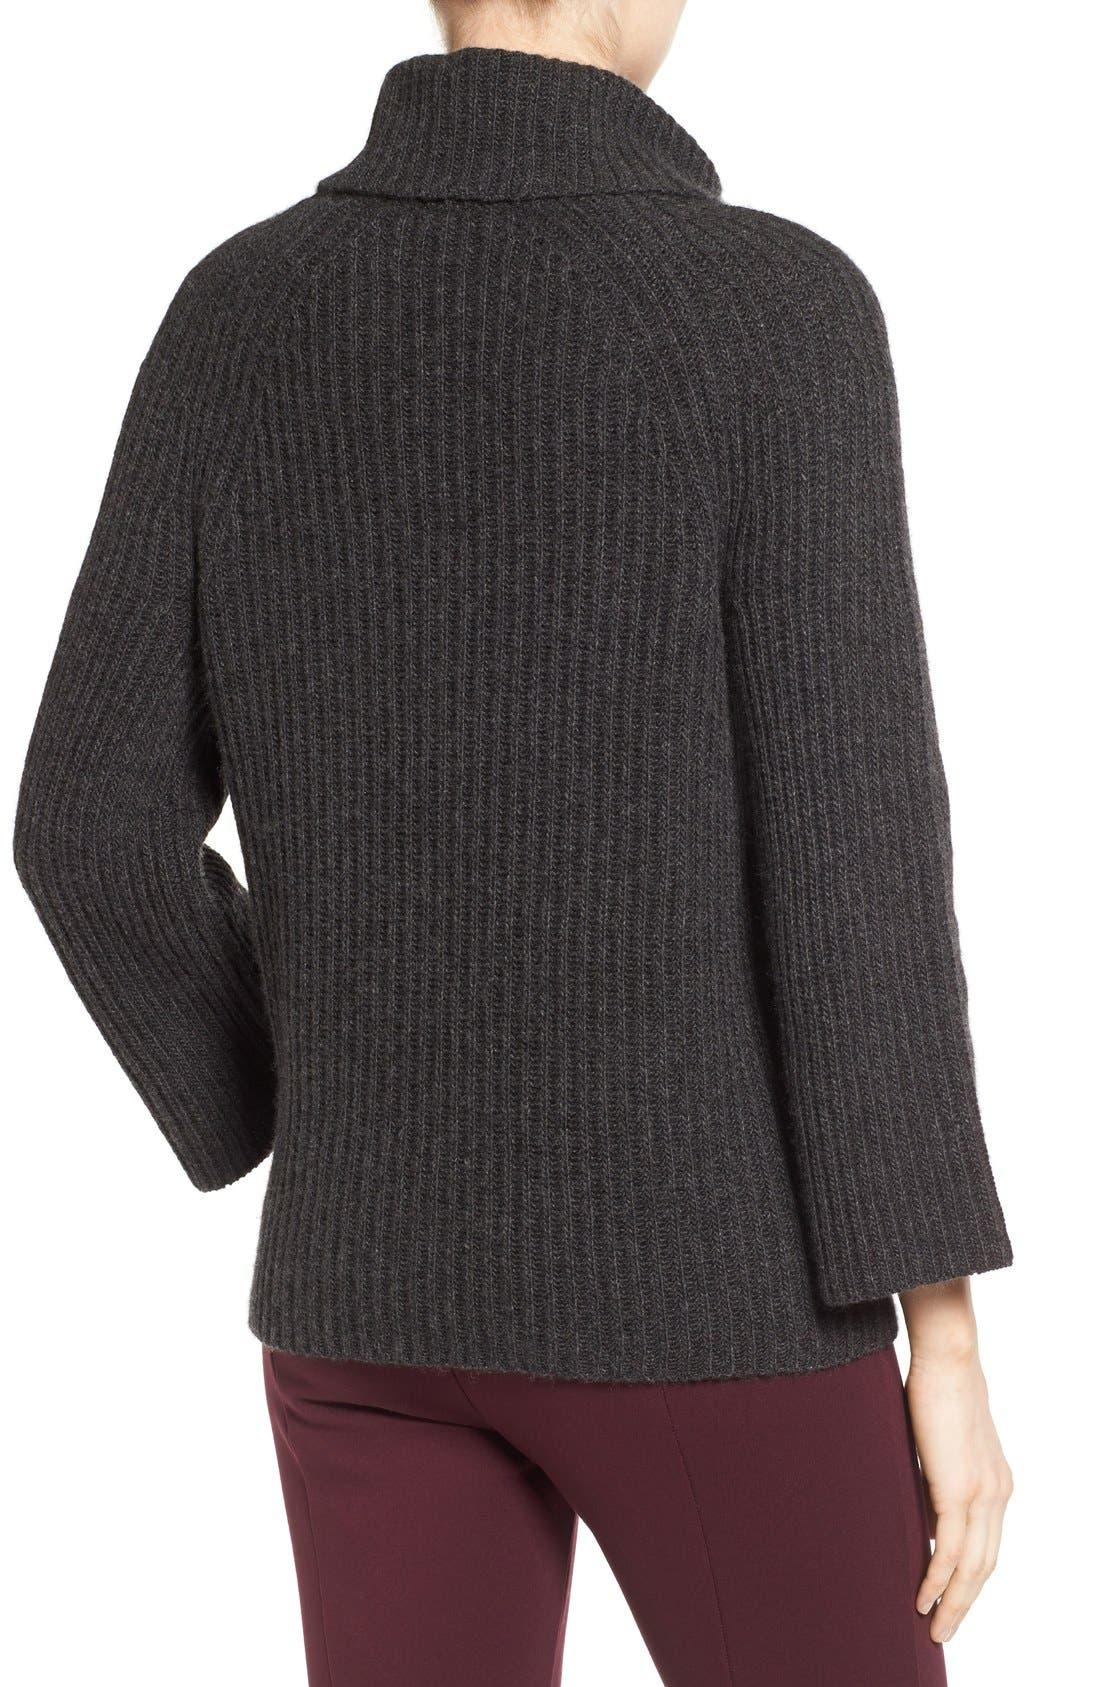 Ribbed Cashmere Turtleneck Sweater,                             Alternate thumbnail 5, color,                             021